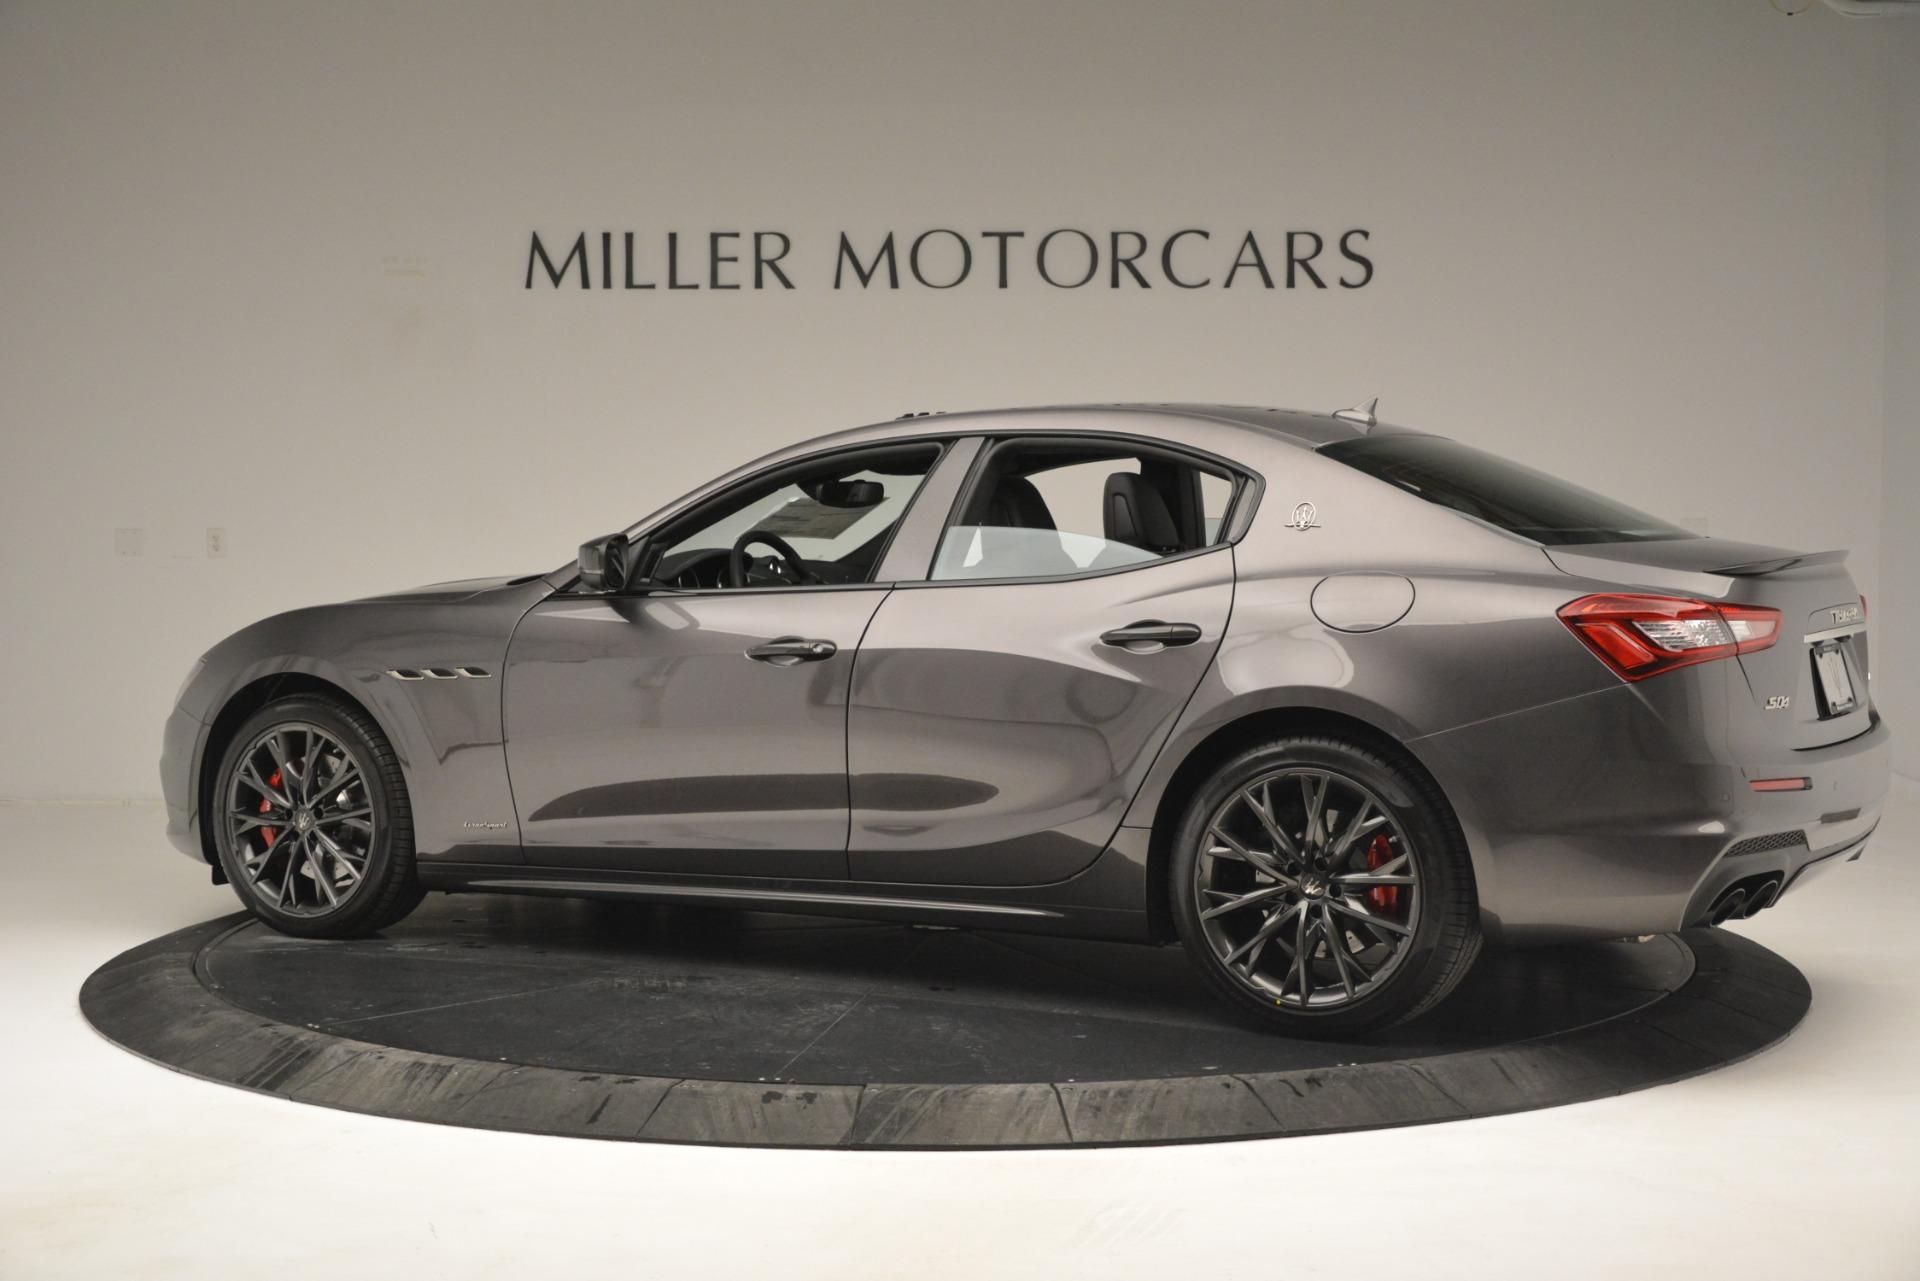 New 2019 Maserati Ghibli S Q4 GranSport For Sale In Westport, CT 2925_p5